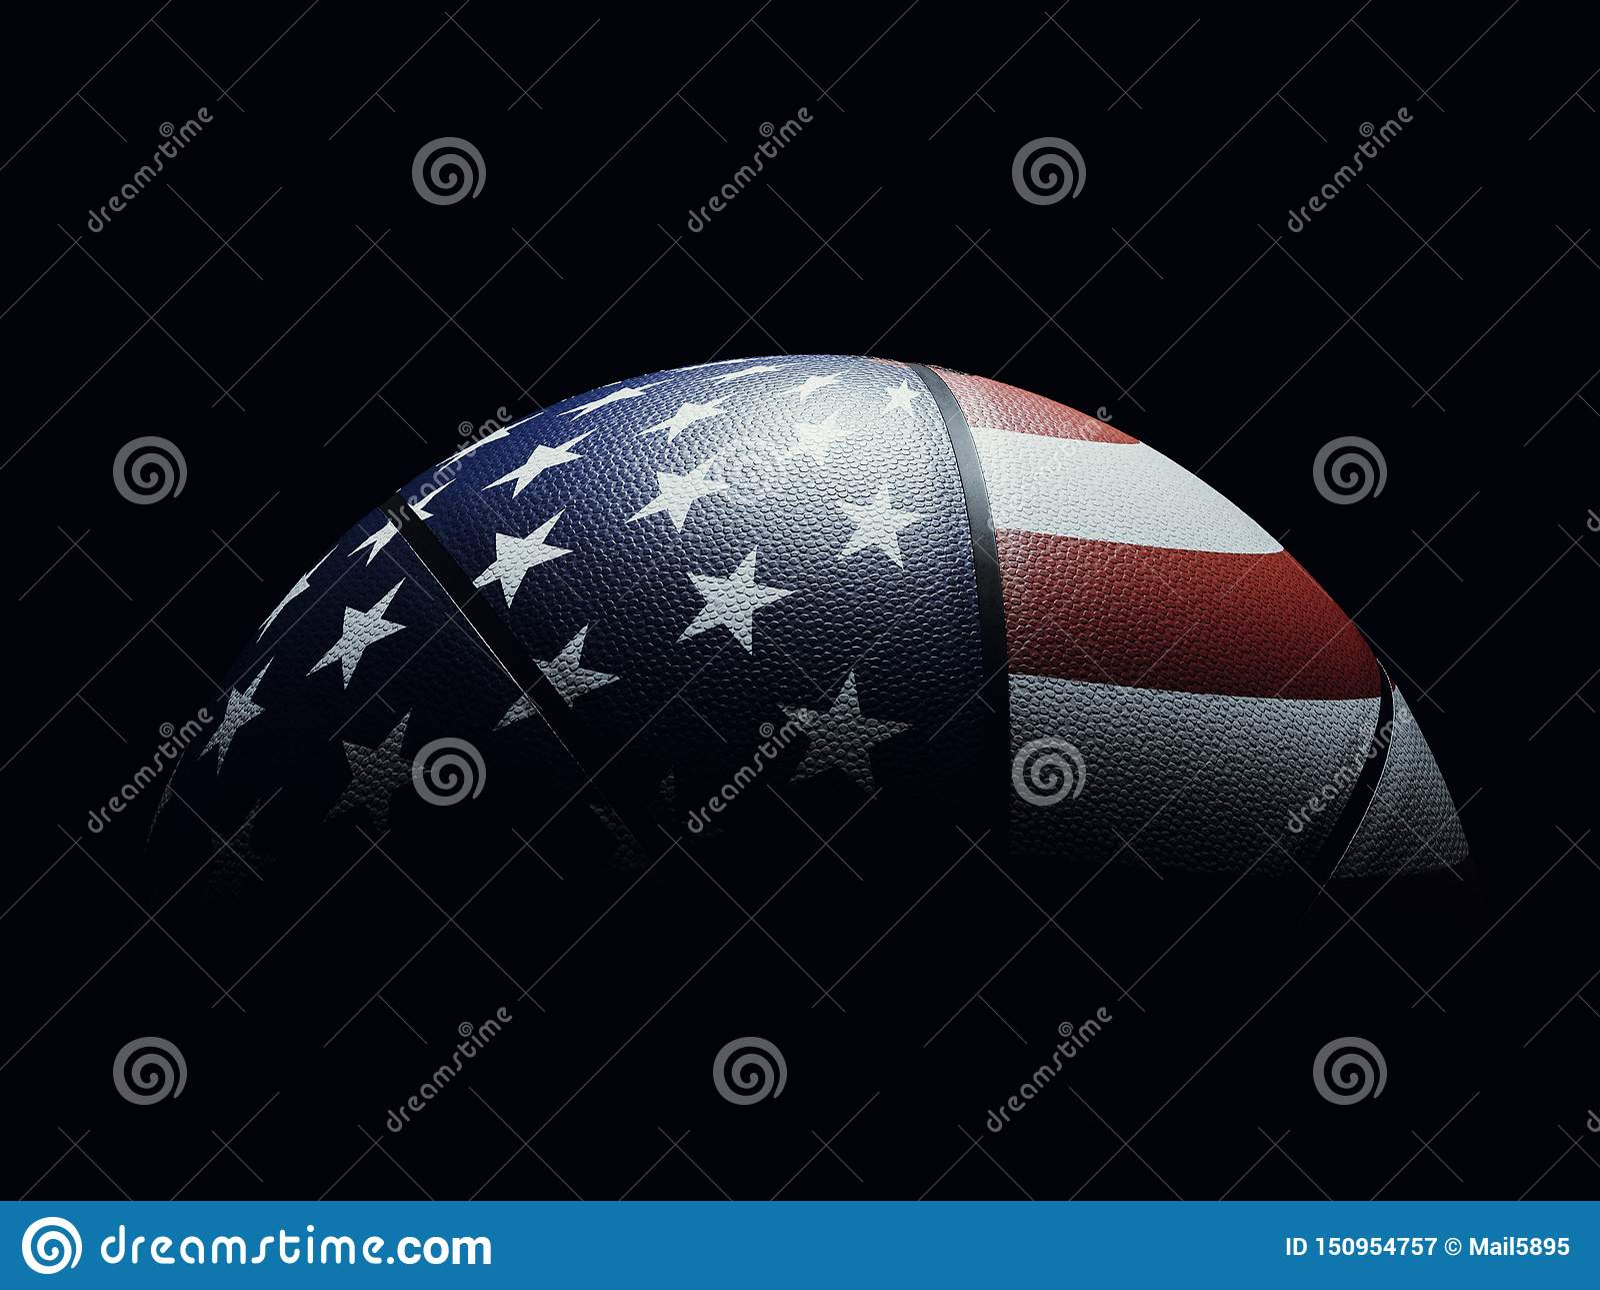 Basketball Ball Colored Like United States Flag Wallpaper Stock